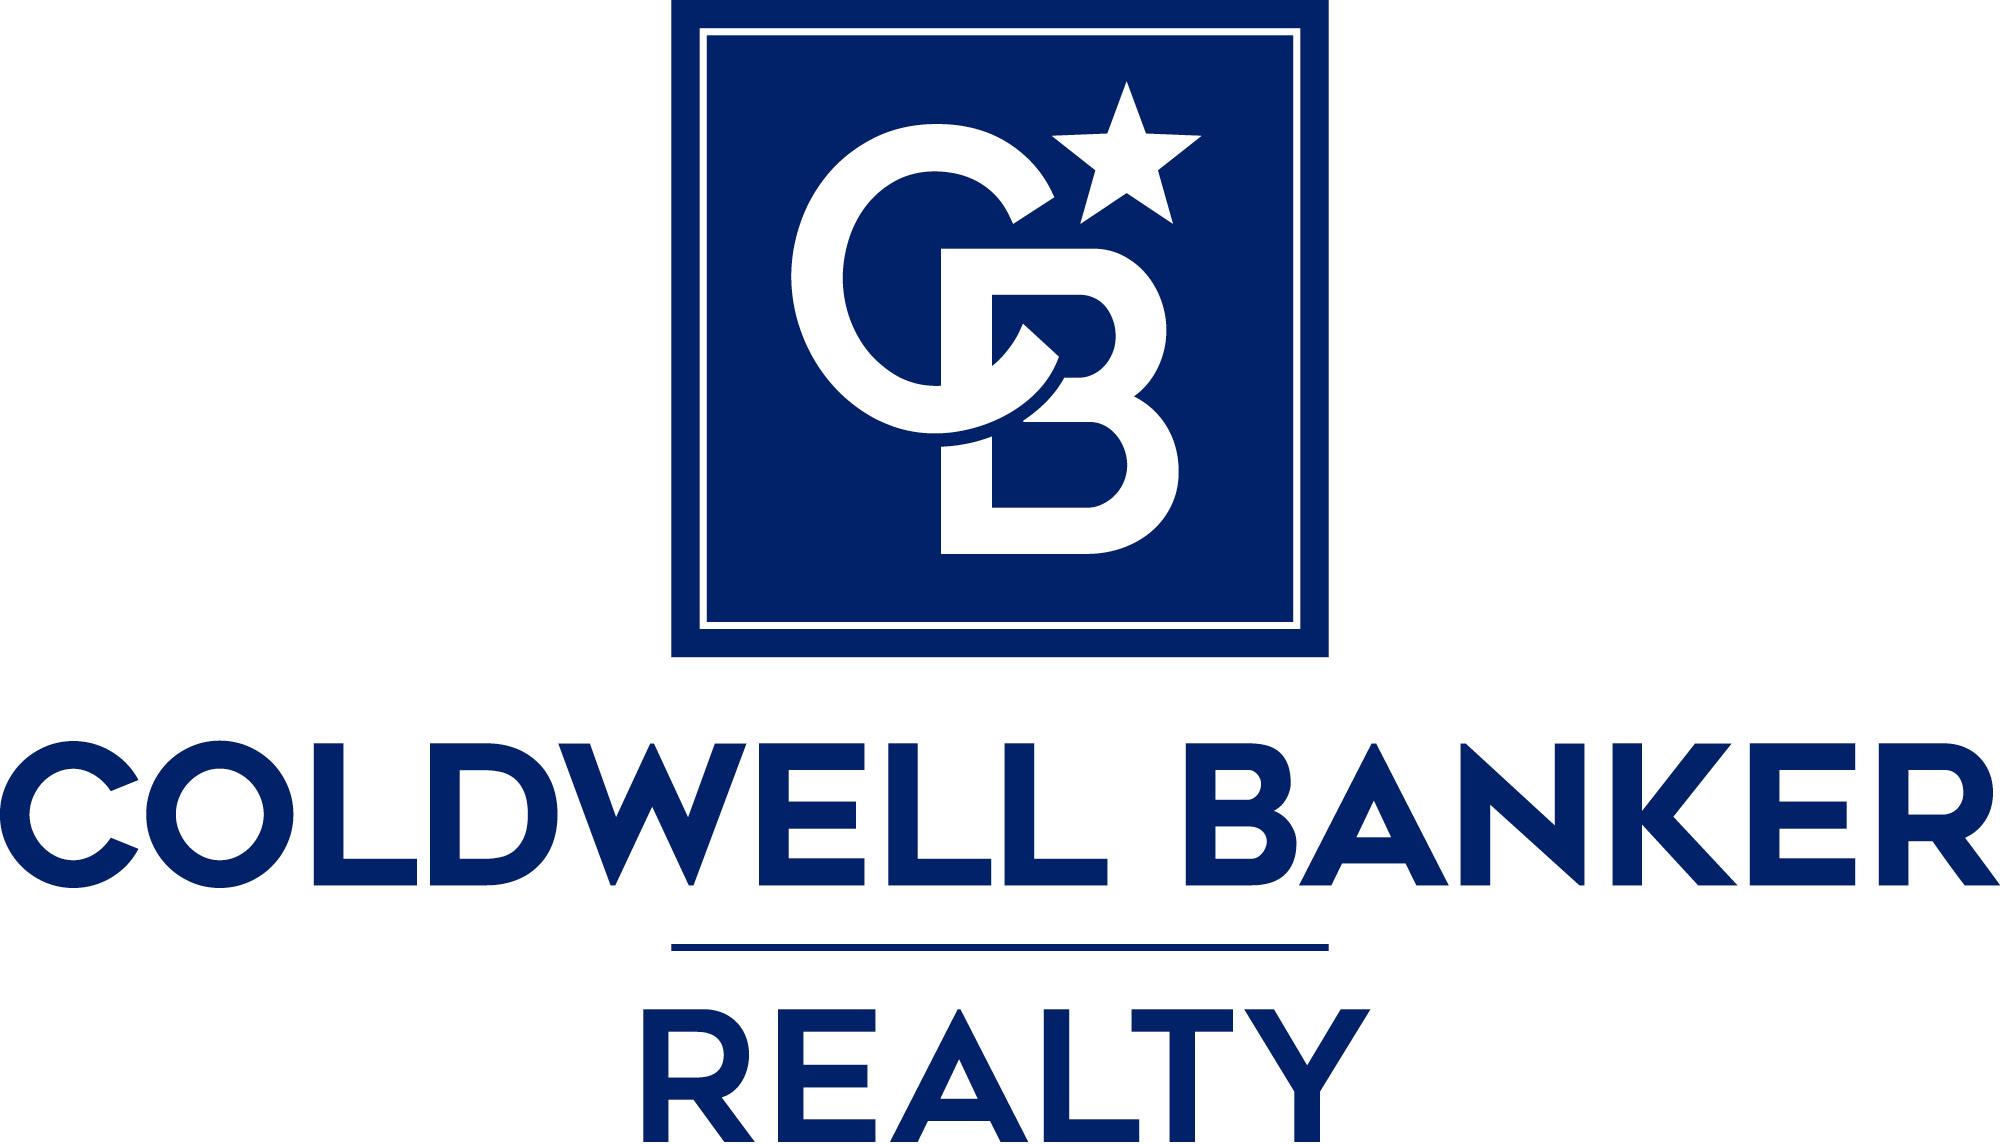 Coldwell Banker Res Brokerage